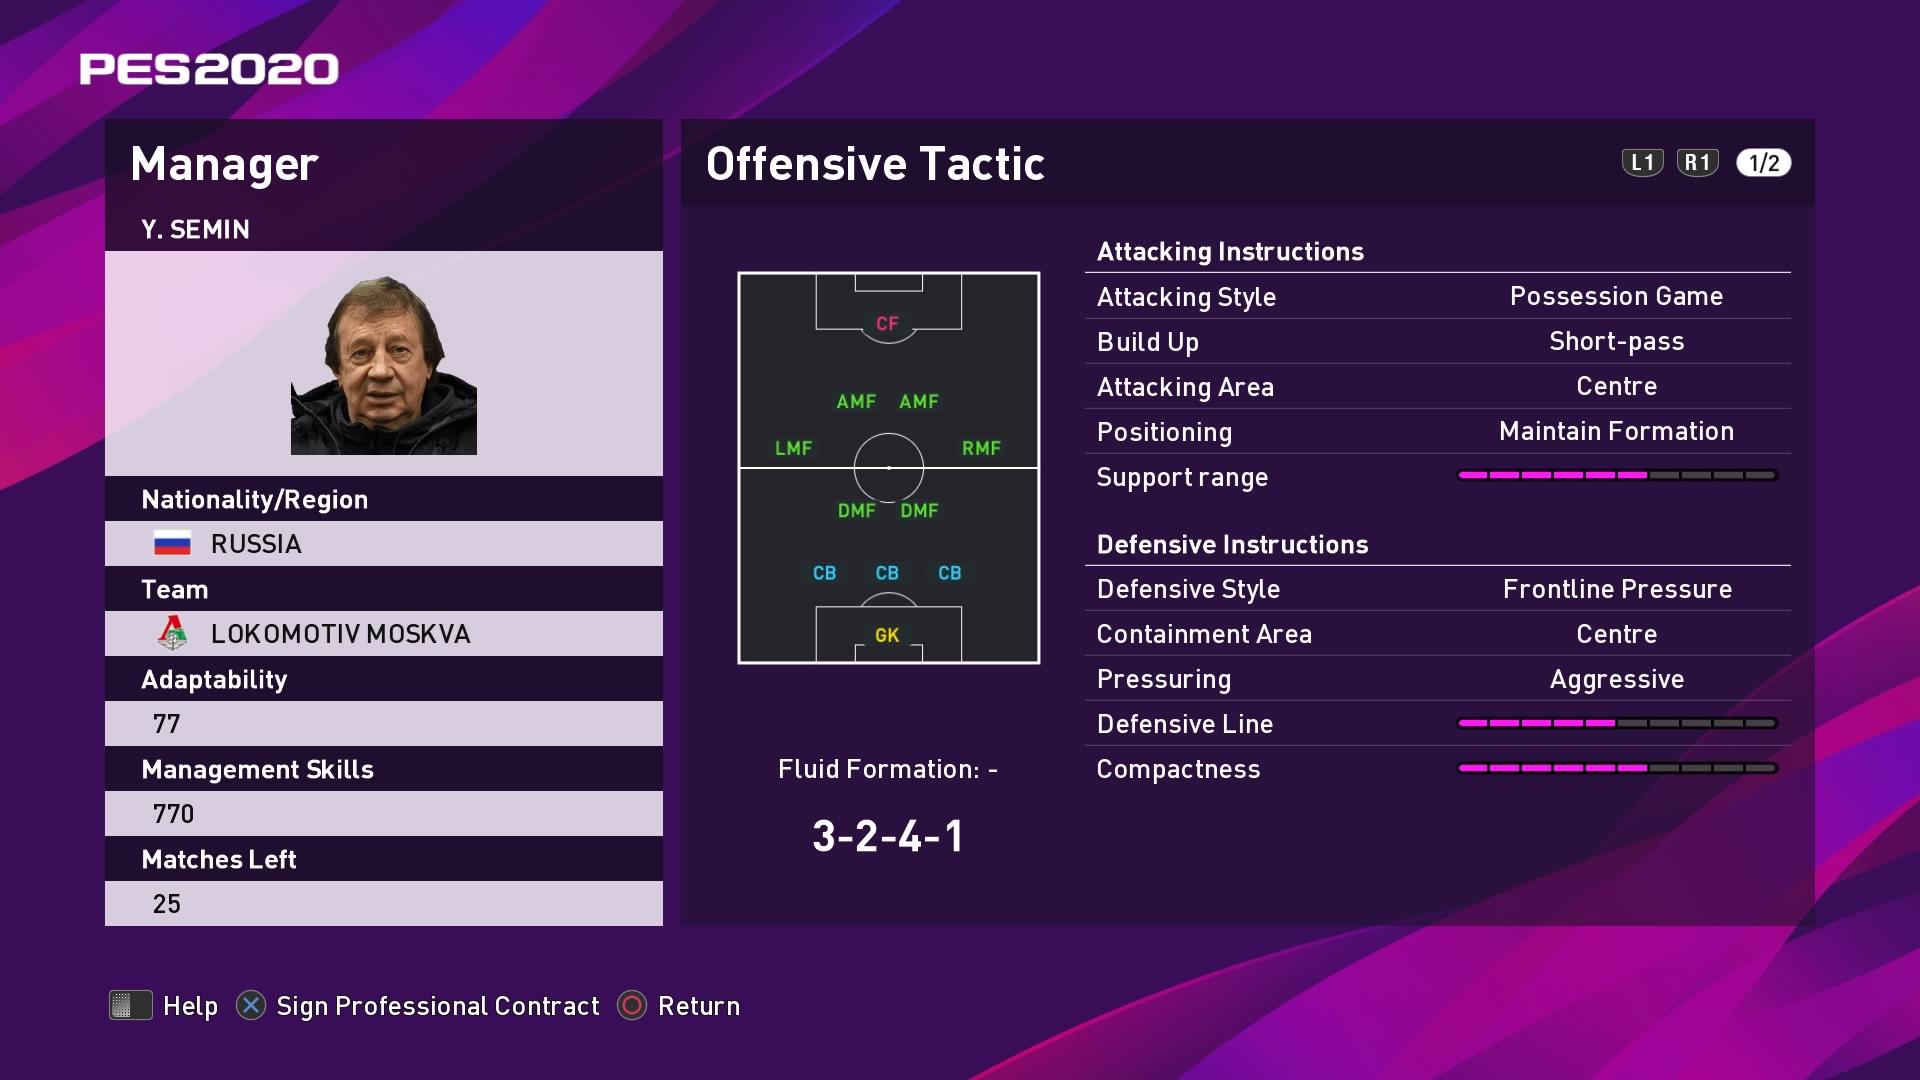 Y. Semin (Yuri Semin) Offensive Tactic in PES 2020 myClub